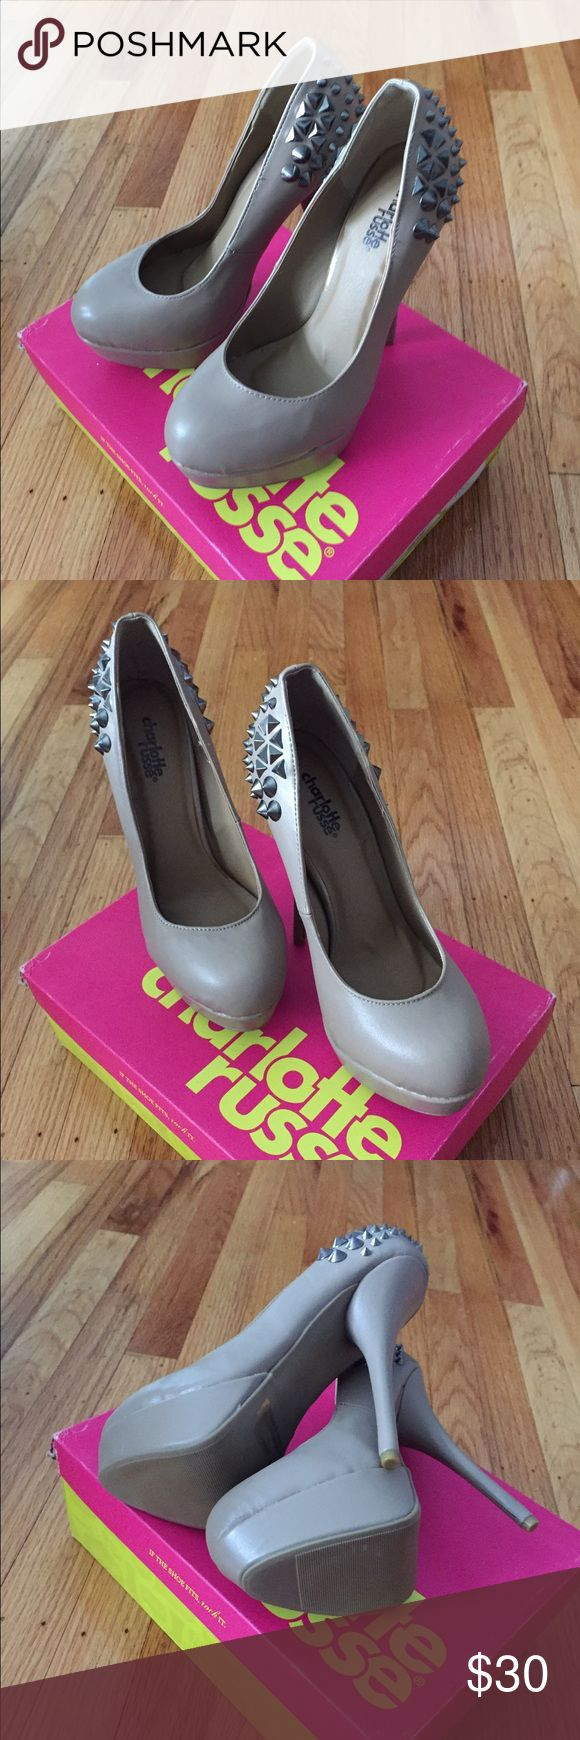 NIB Charlotte Russe Taupe Spiked Heels NIB Charlotte Russe Taupe Spiked Heels. Size 7 Charlotte Russe Shoes Heels